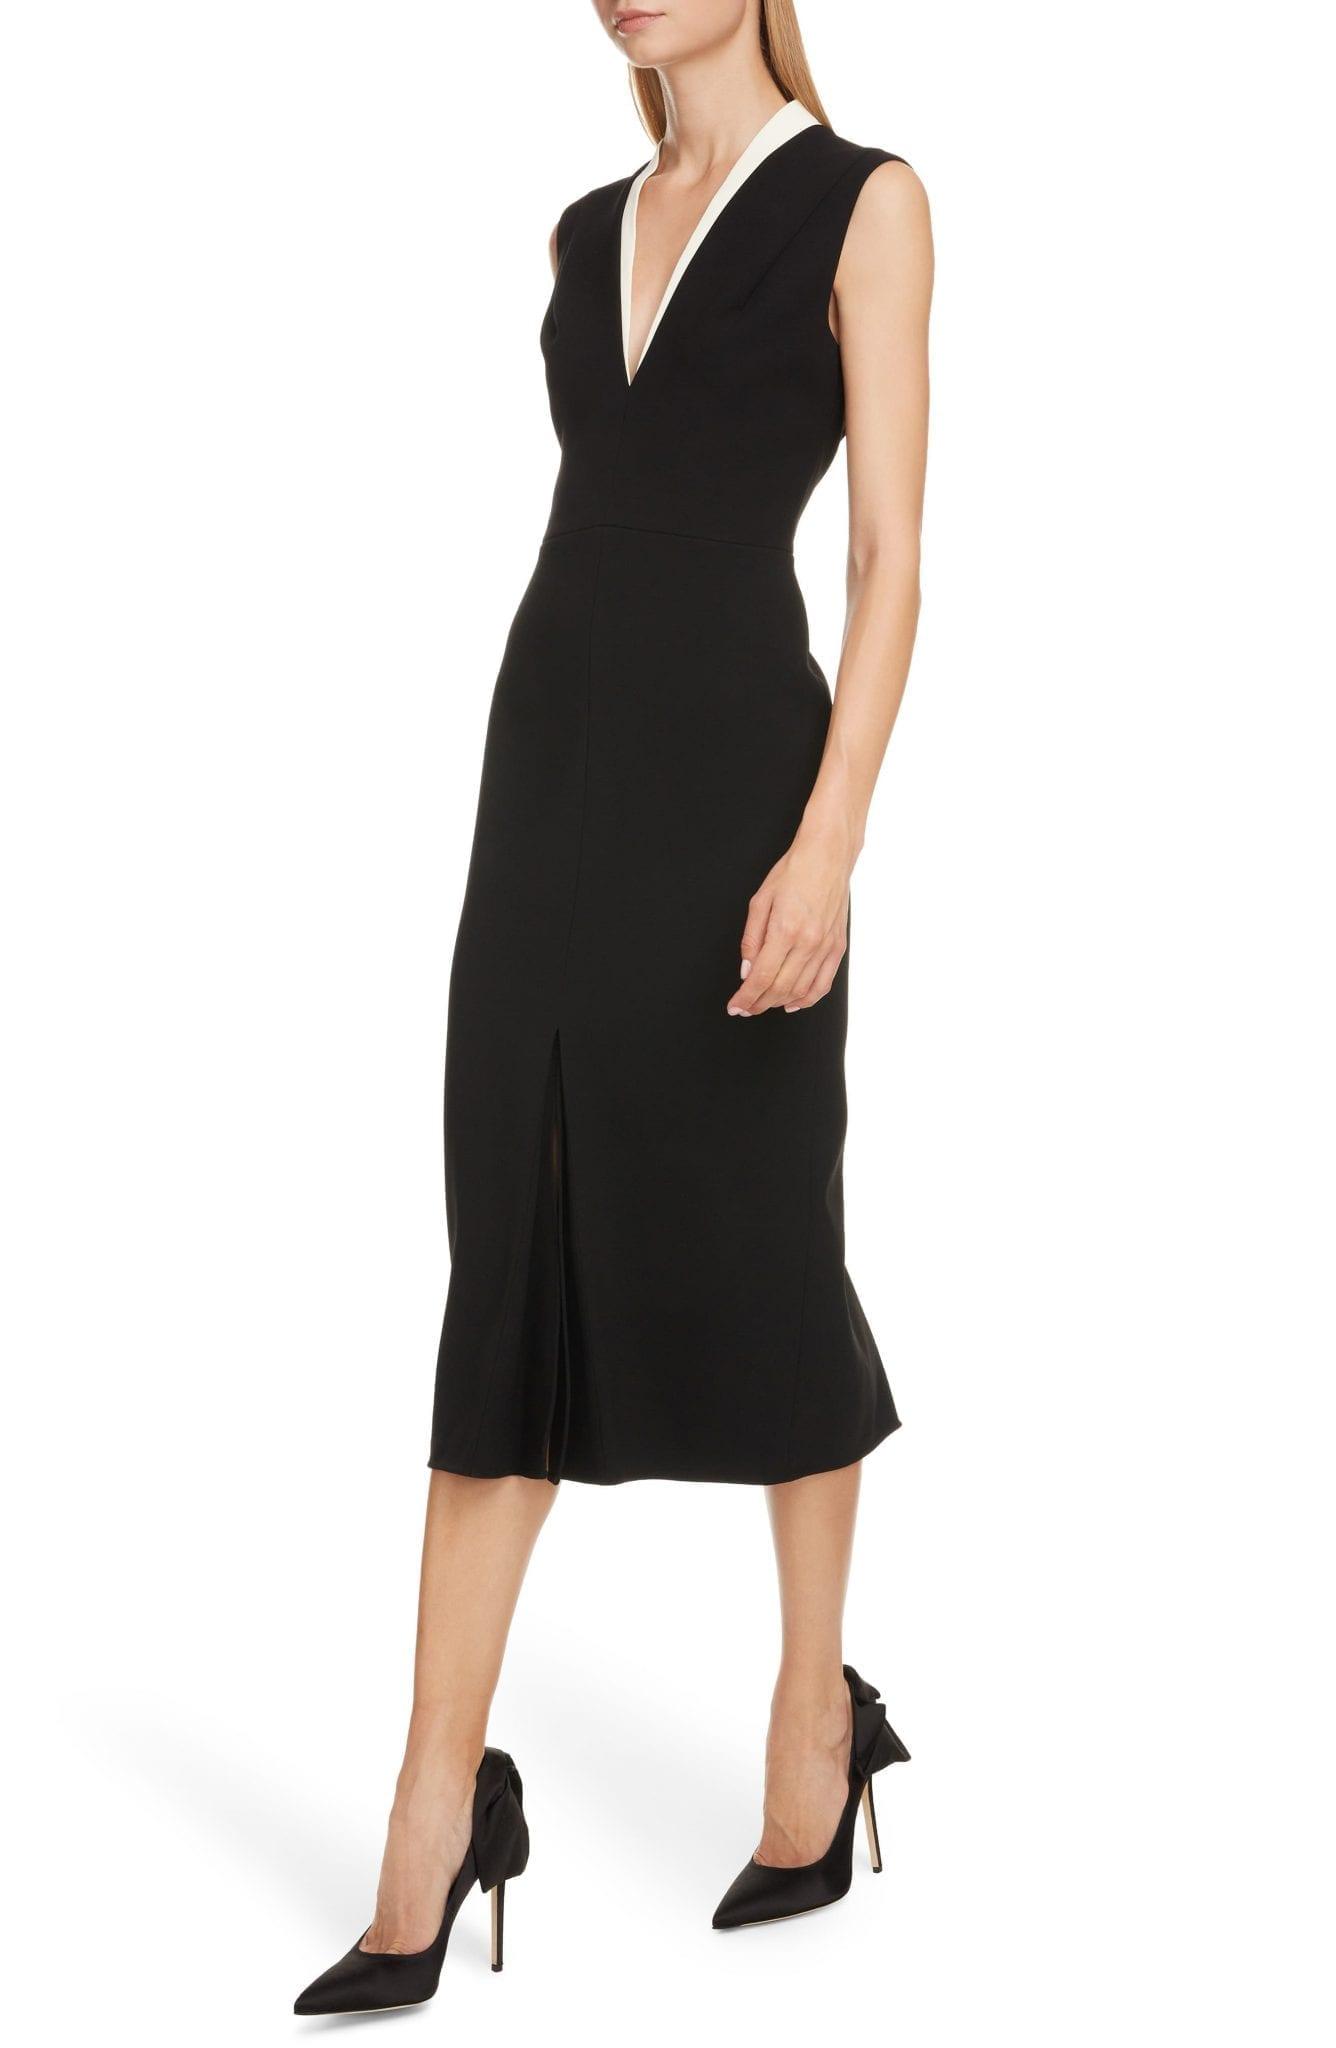 VICTORIA BECKHAM Contrast Collar Bonded Crepe Midi Sheath Dress